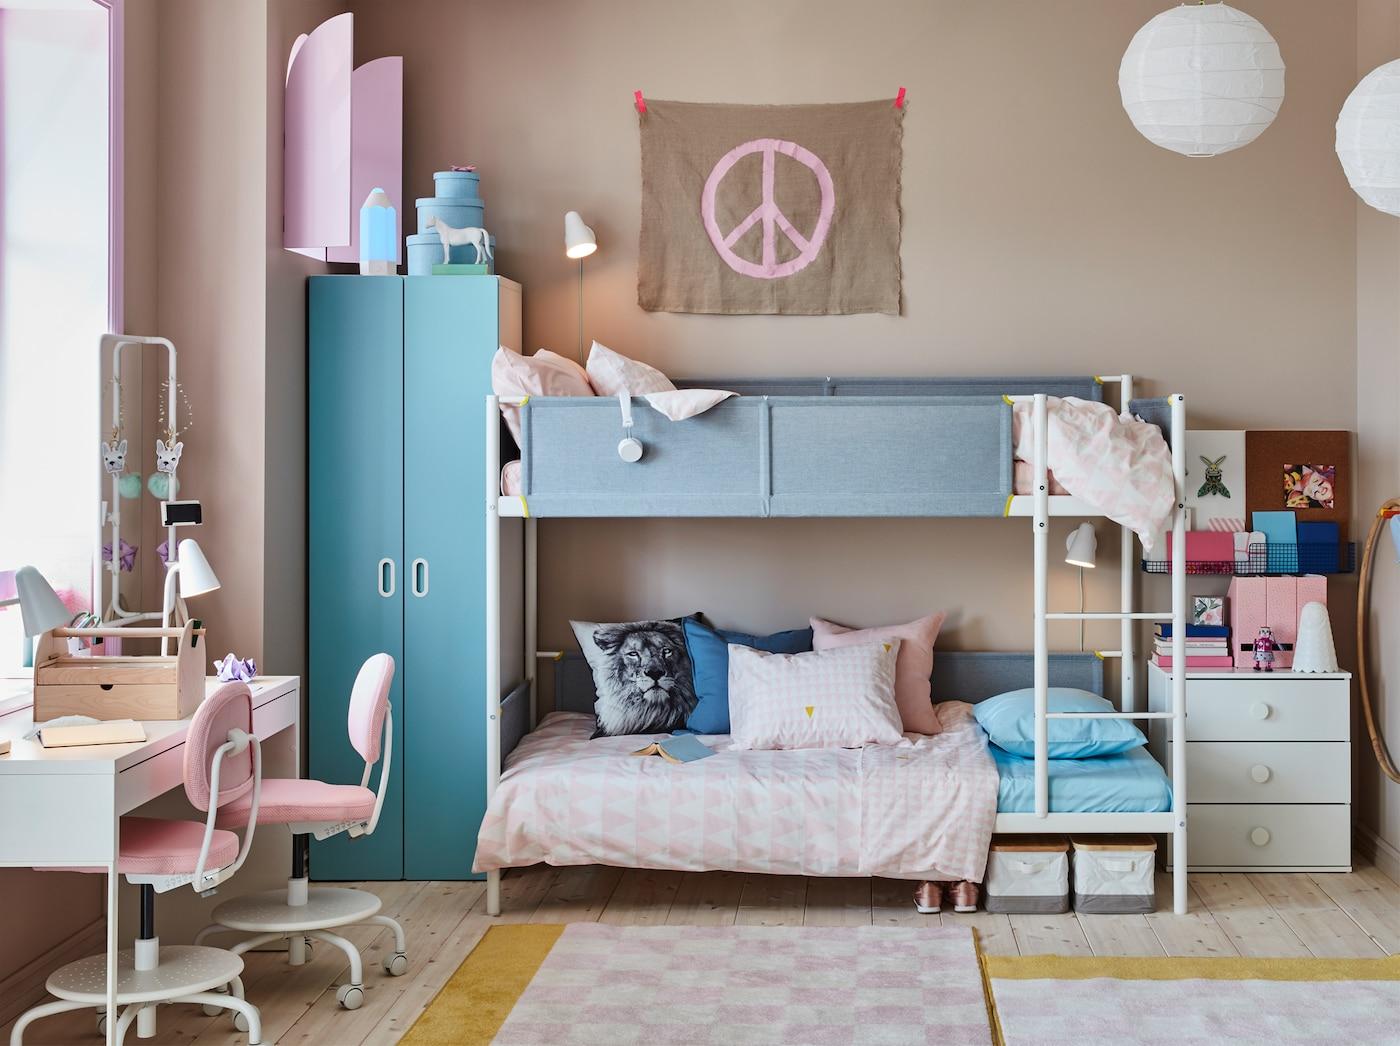 Chambre Garcon 2 Ans Ikea chambre pour enfants créatifs - ikea